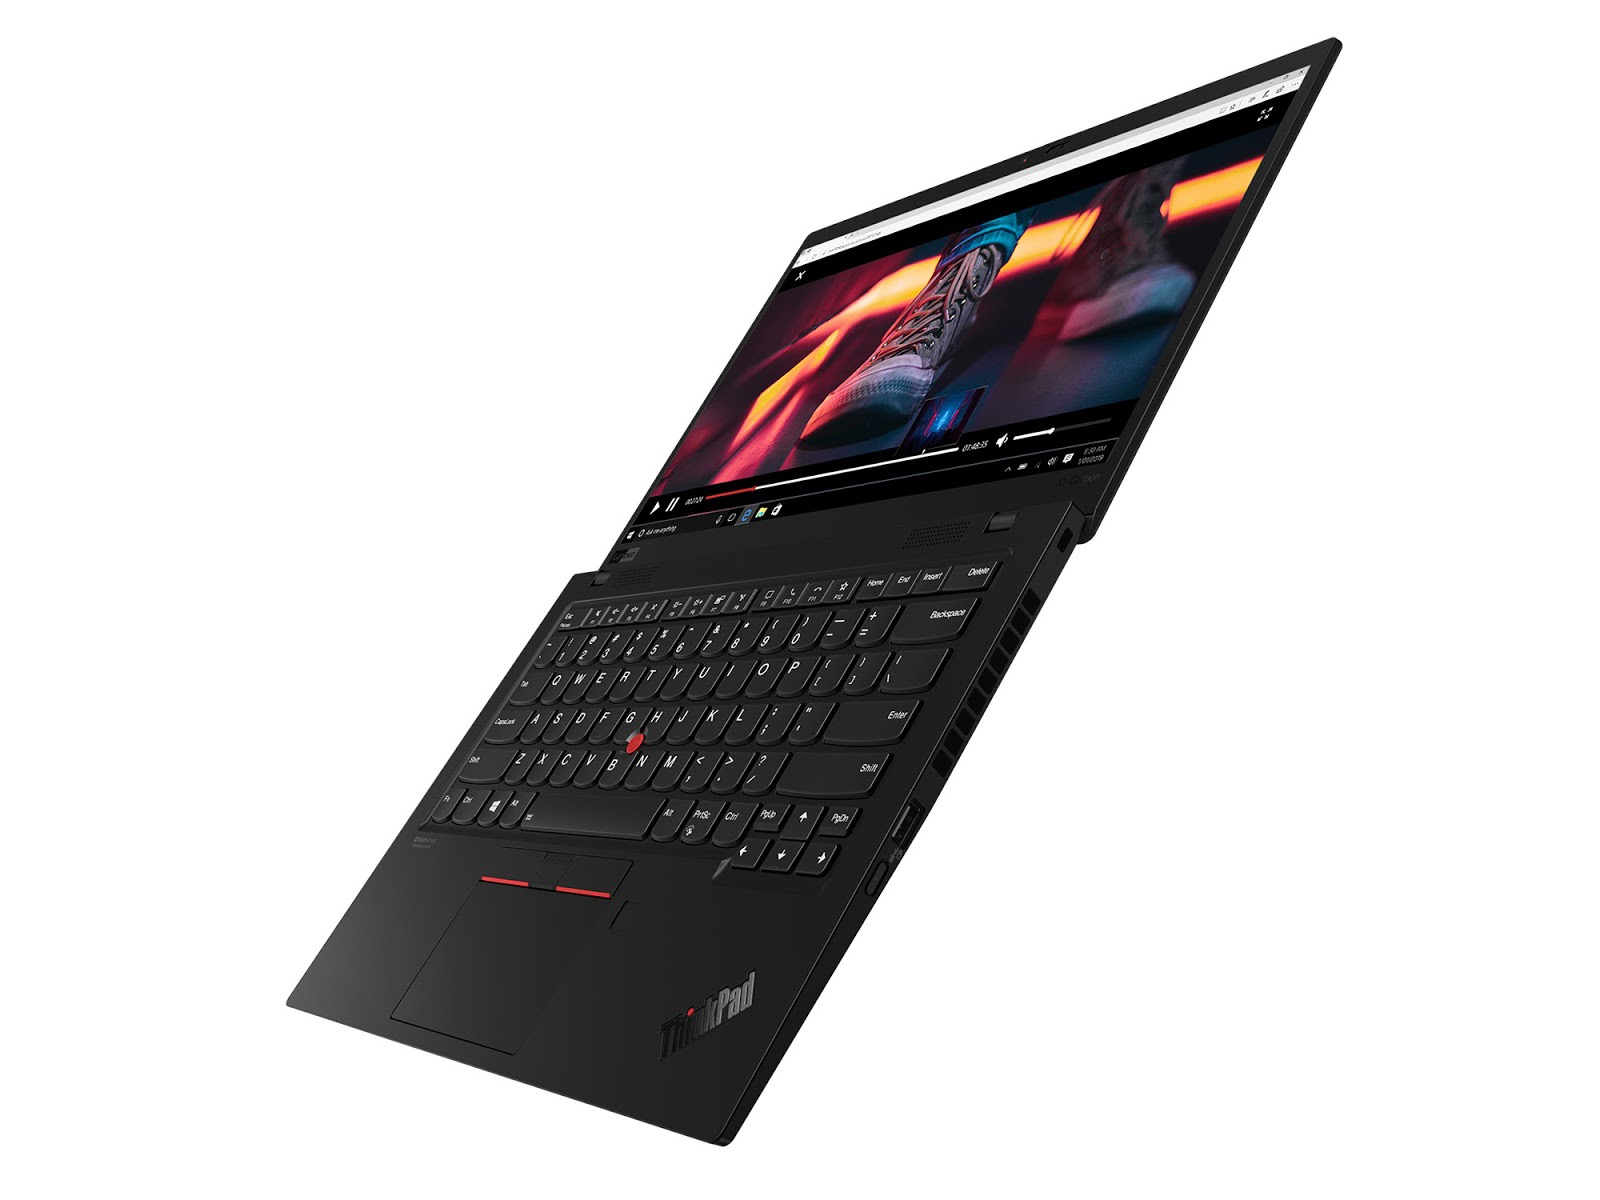 Фото 1. Ноутбук Lenovo ThinkPad X1 Carbon Gen 8 Black (20U9004PRT)